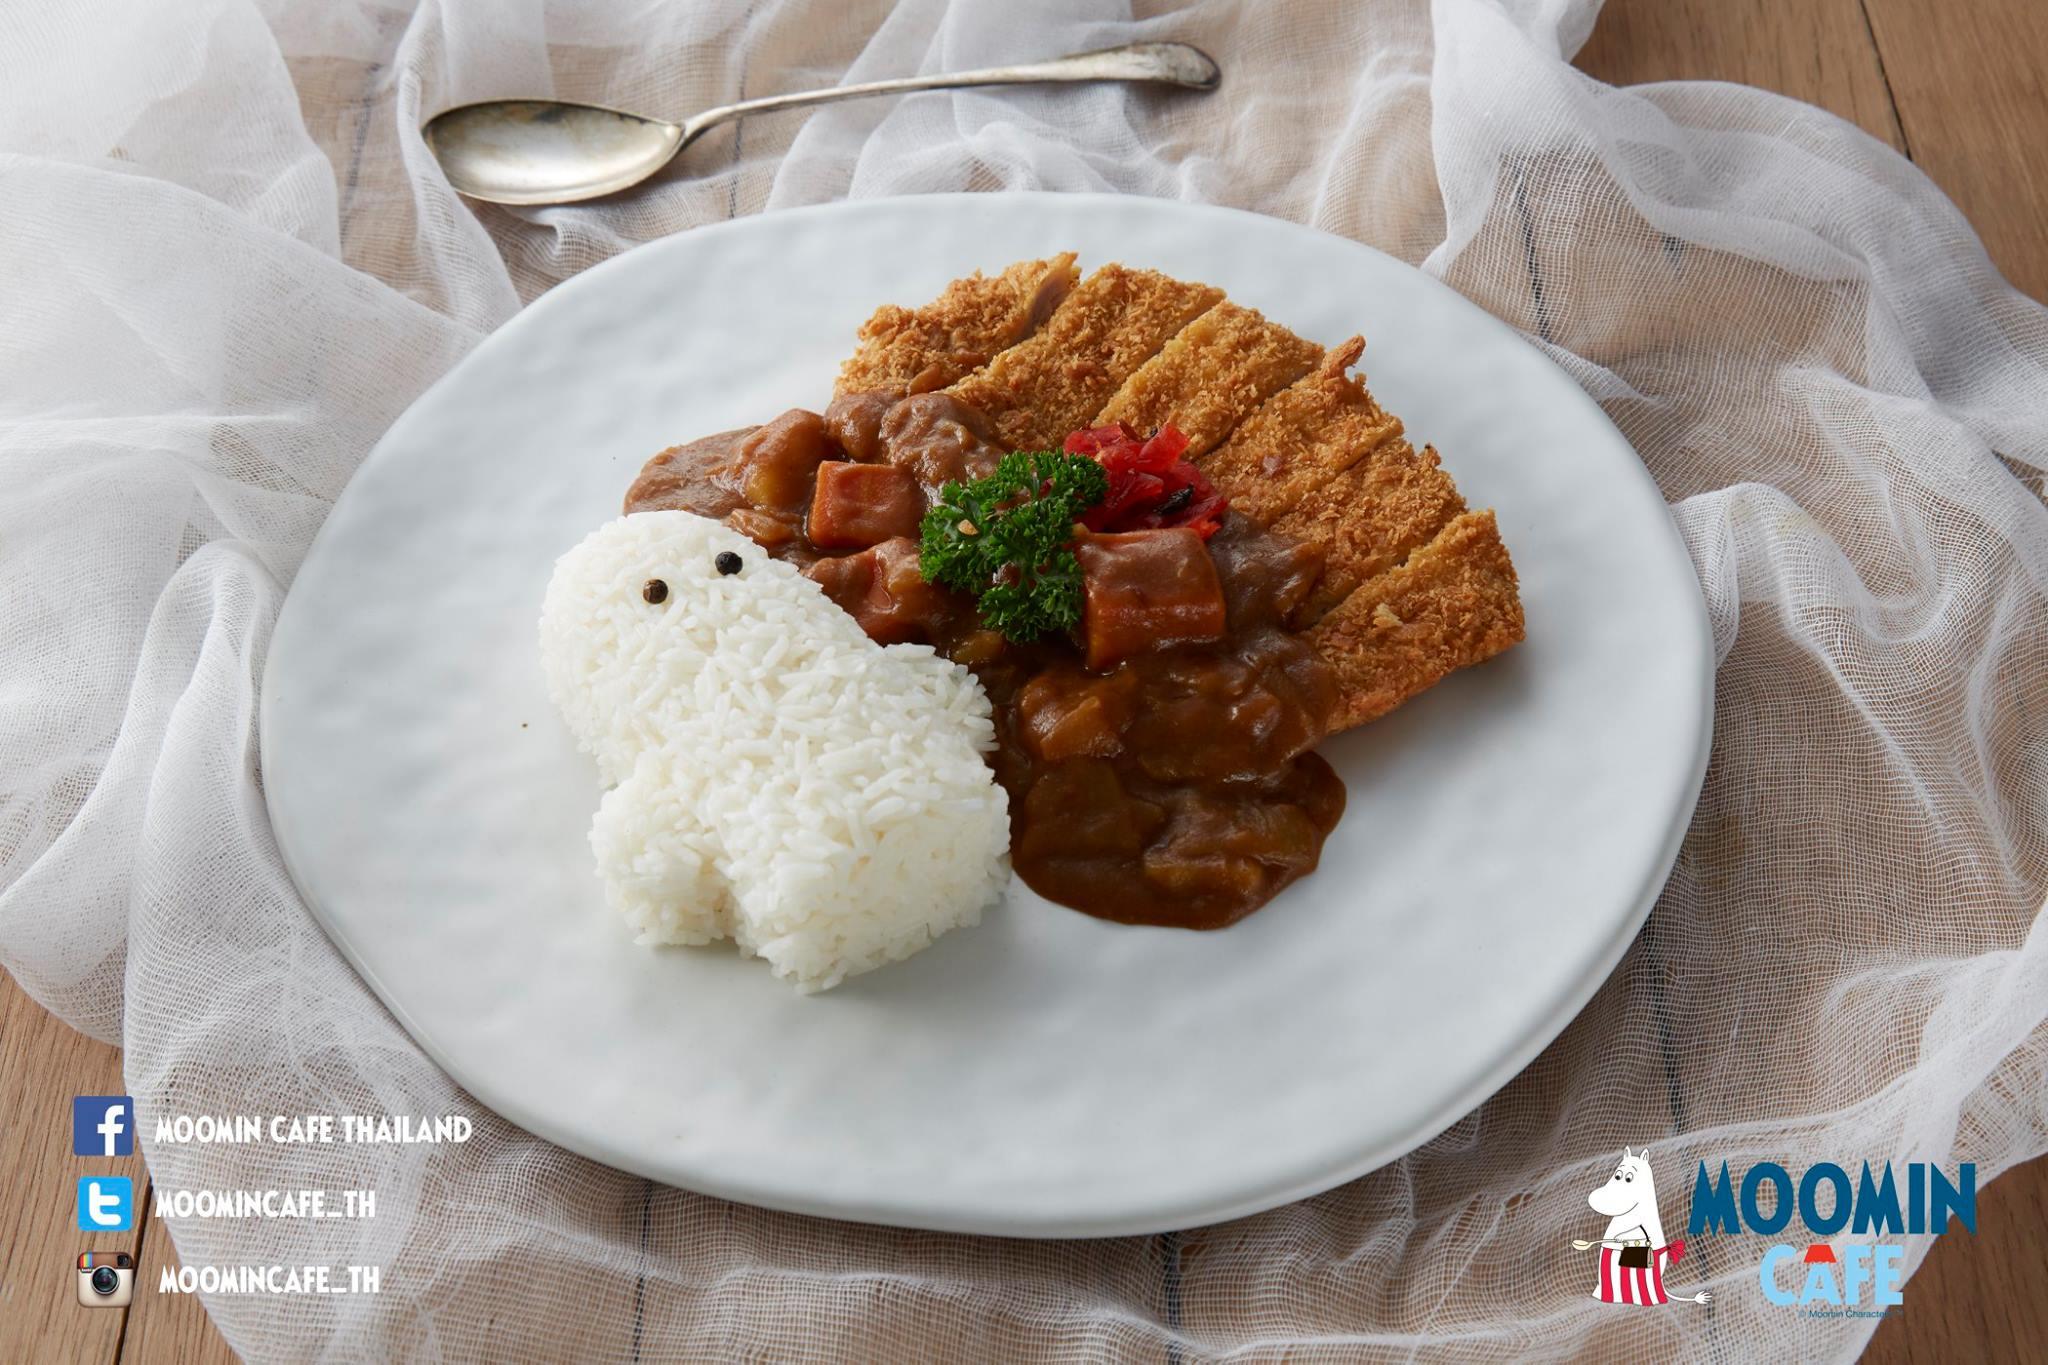 FB : Moomin Cafe Thailand